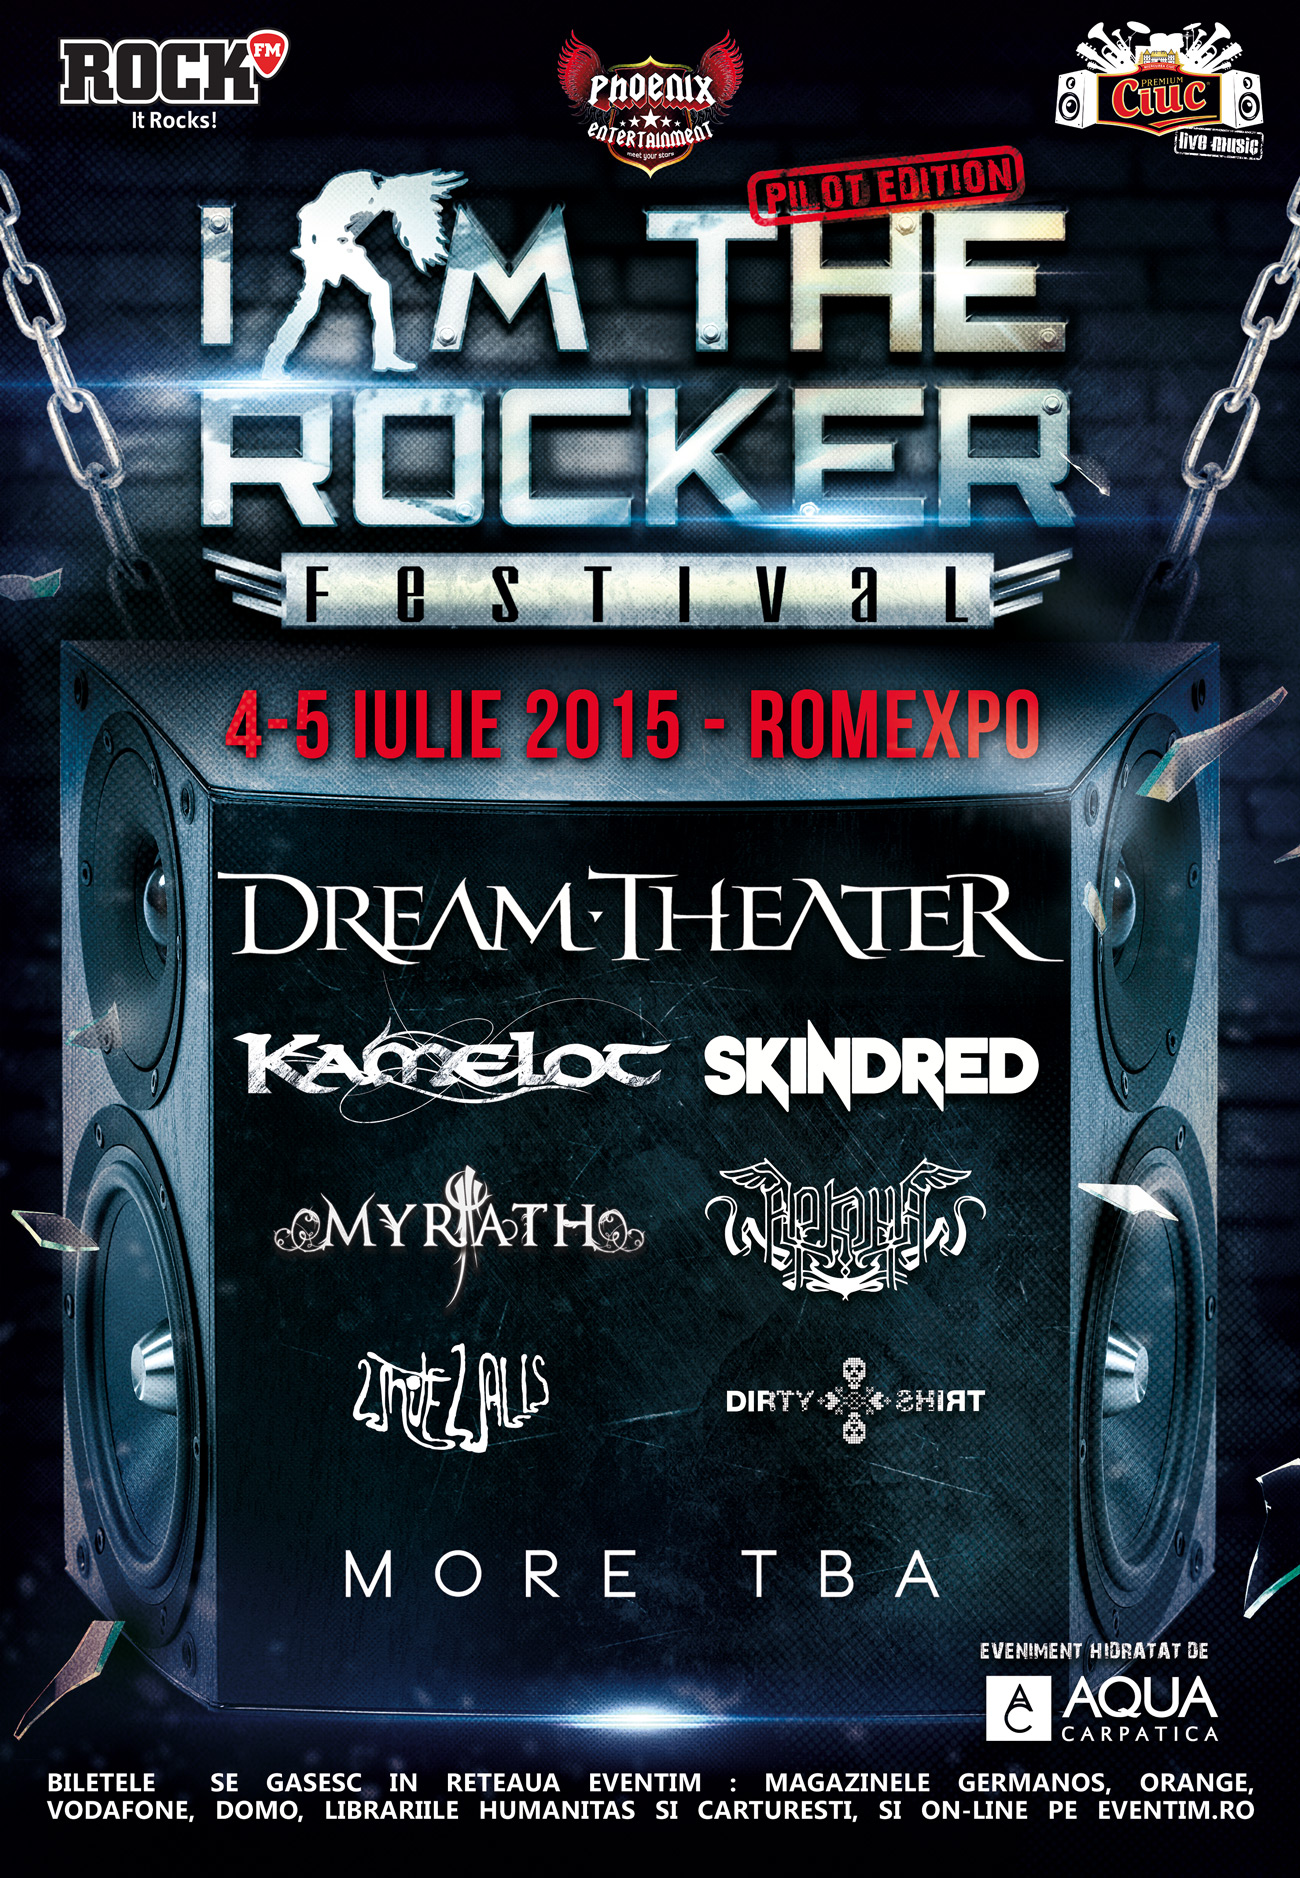 Festivalul de rock, I'am the Rocker la Romexpo